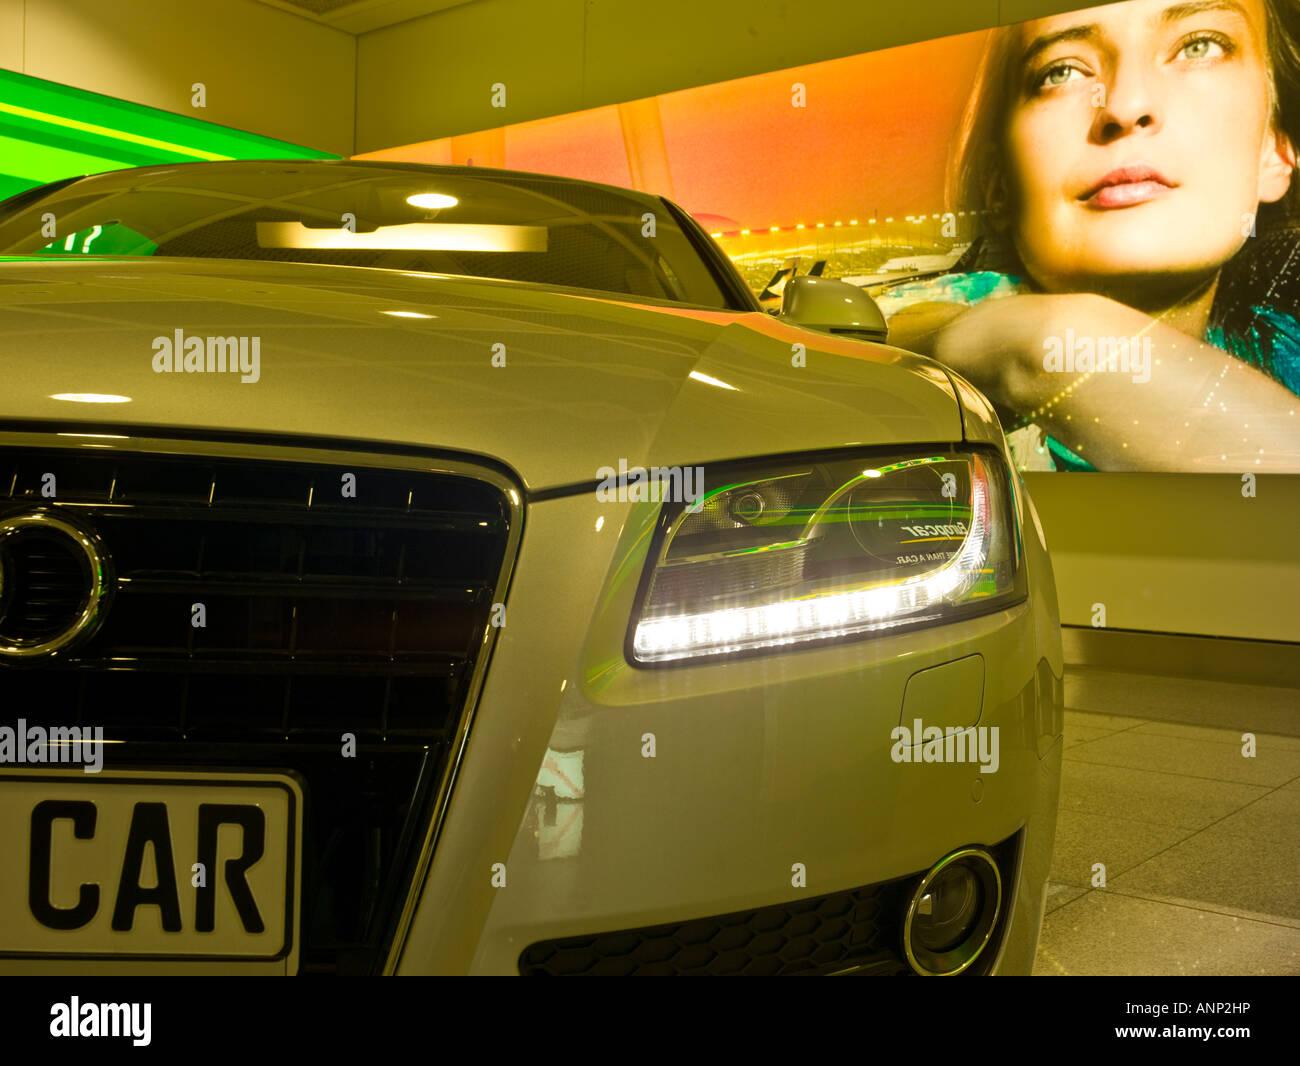 2007 Audi A5 30tdi - Stock Image